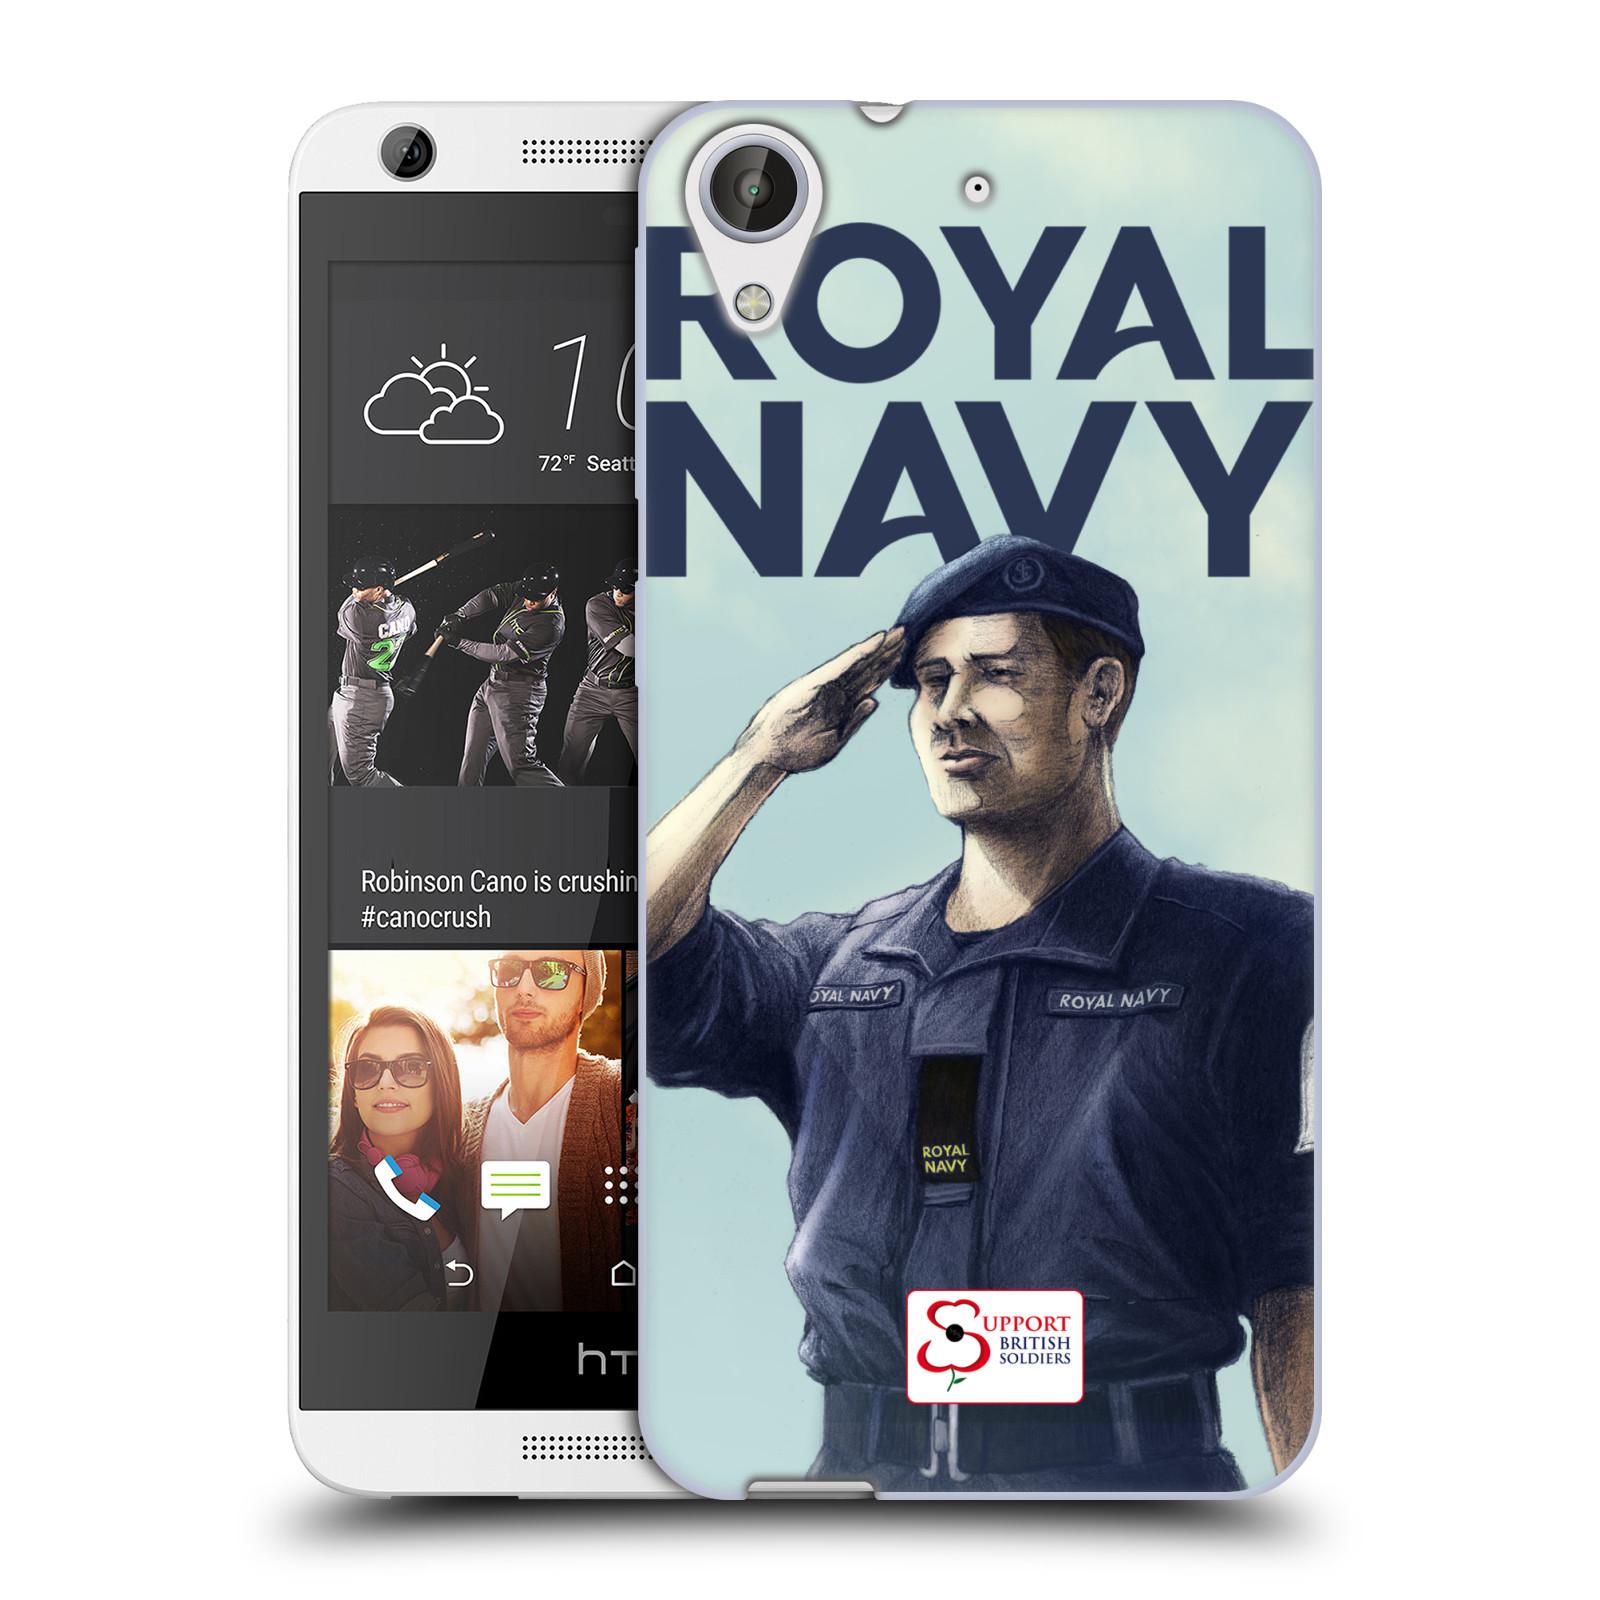 Silikonové pouzdro na mobil HTC Desire 626 / 626G HEAD CASE ROYAL NAVY (Silikonový kryt či obal na mobilní telefon HTC Desire 626 a 626G Dual SIM)